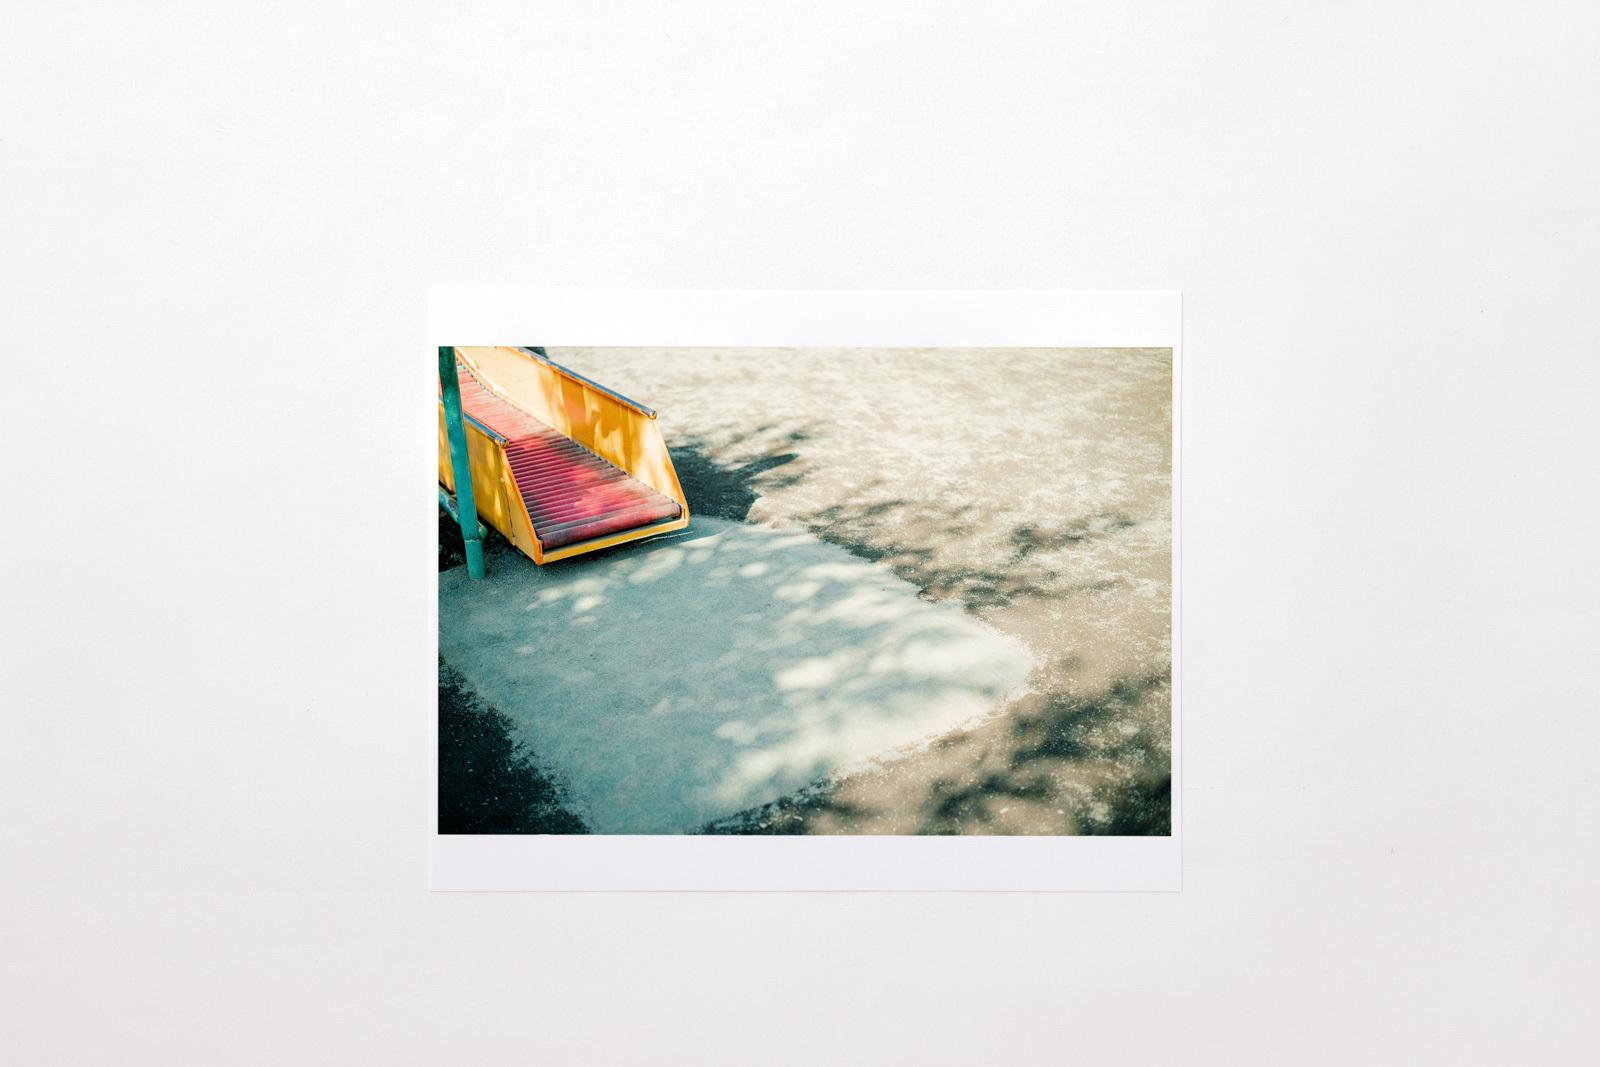 Photograph 05